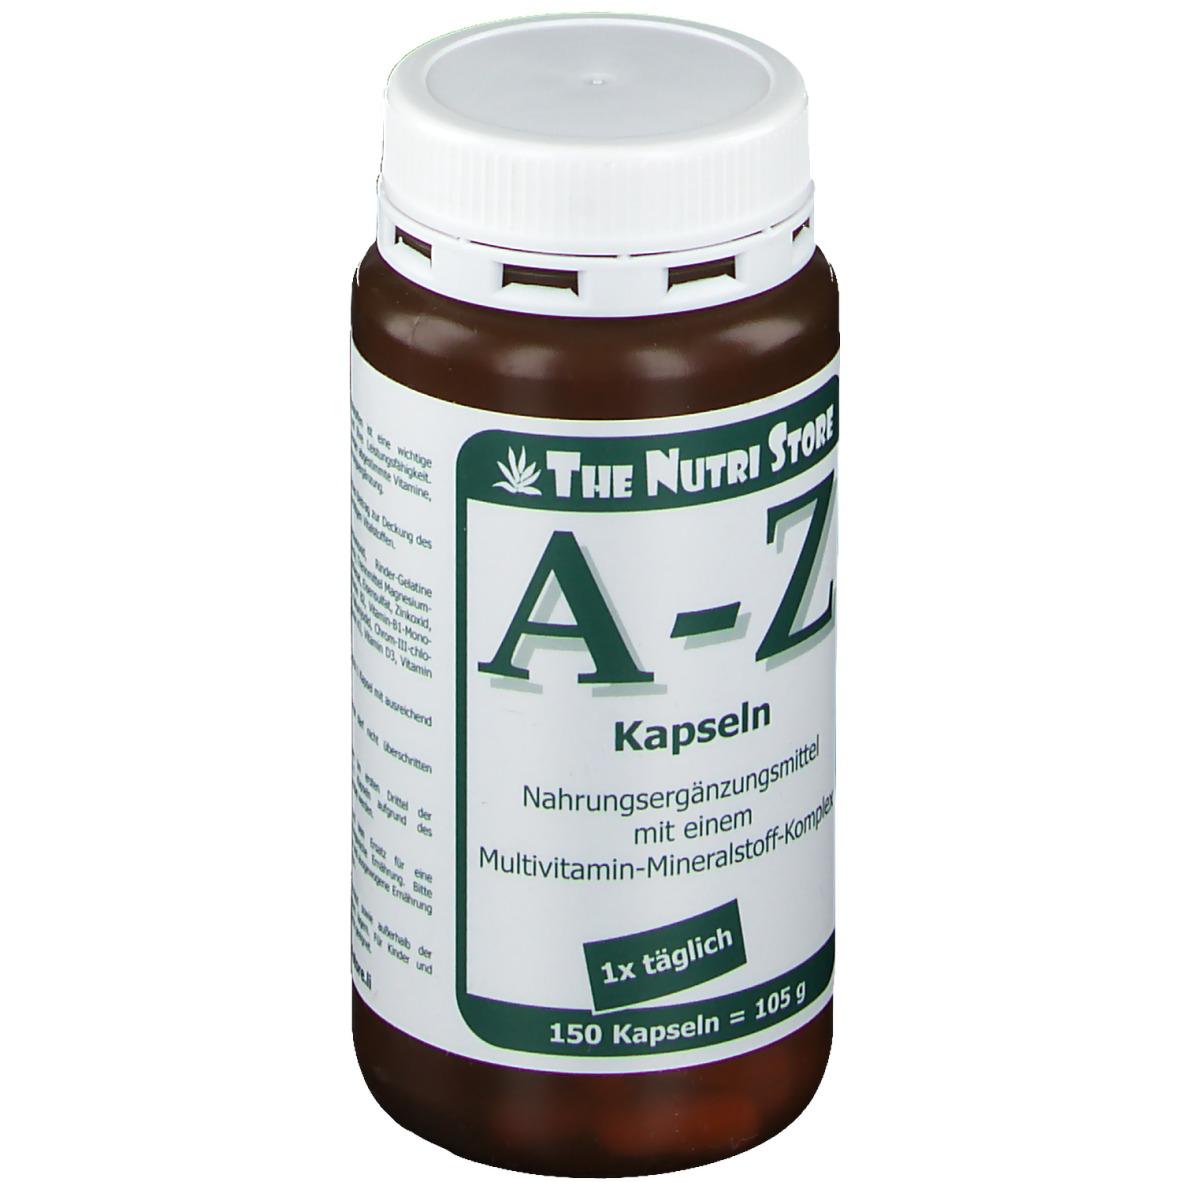 A-Z Multivitamin Mineralstoff Kapseln